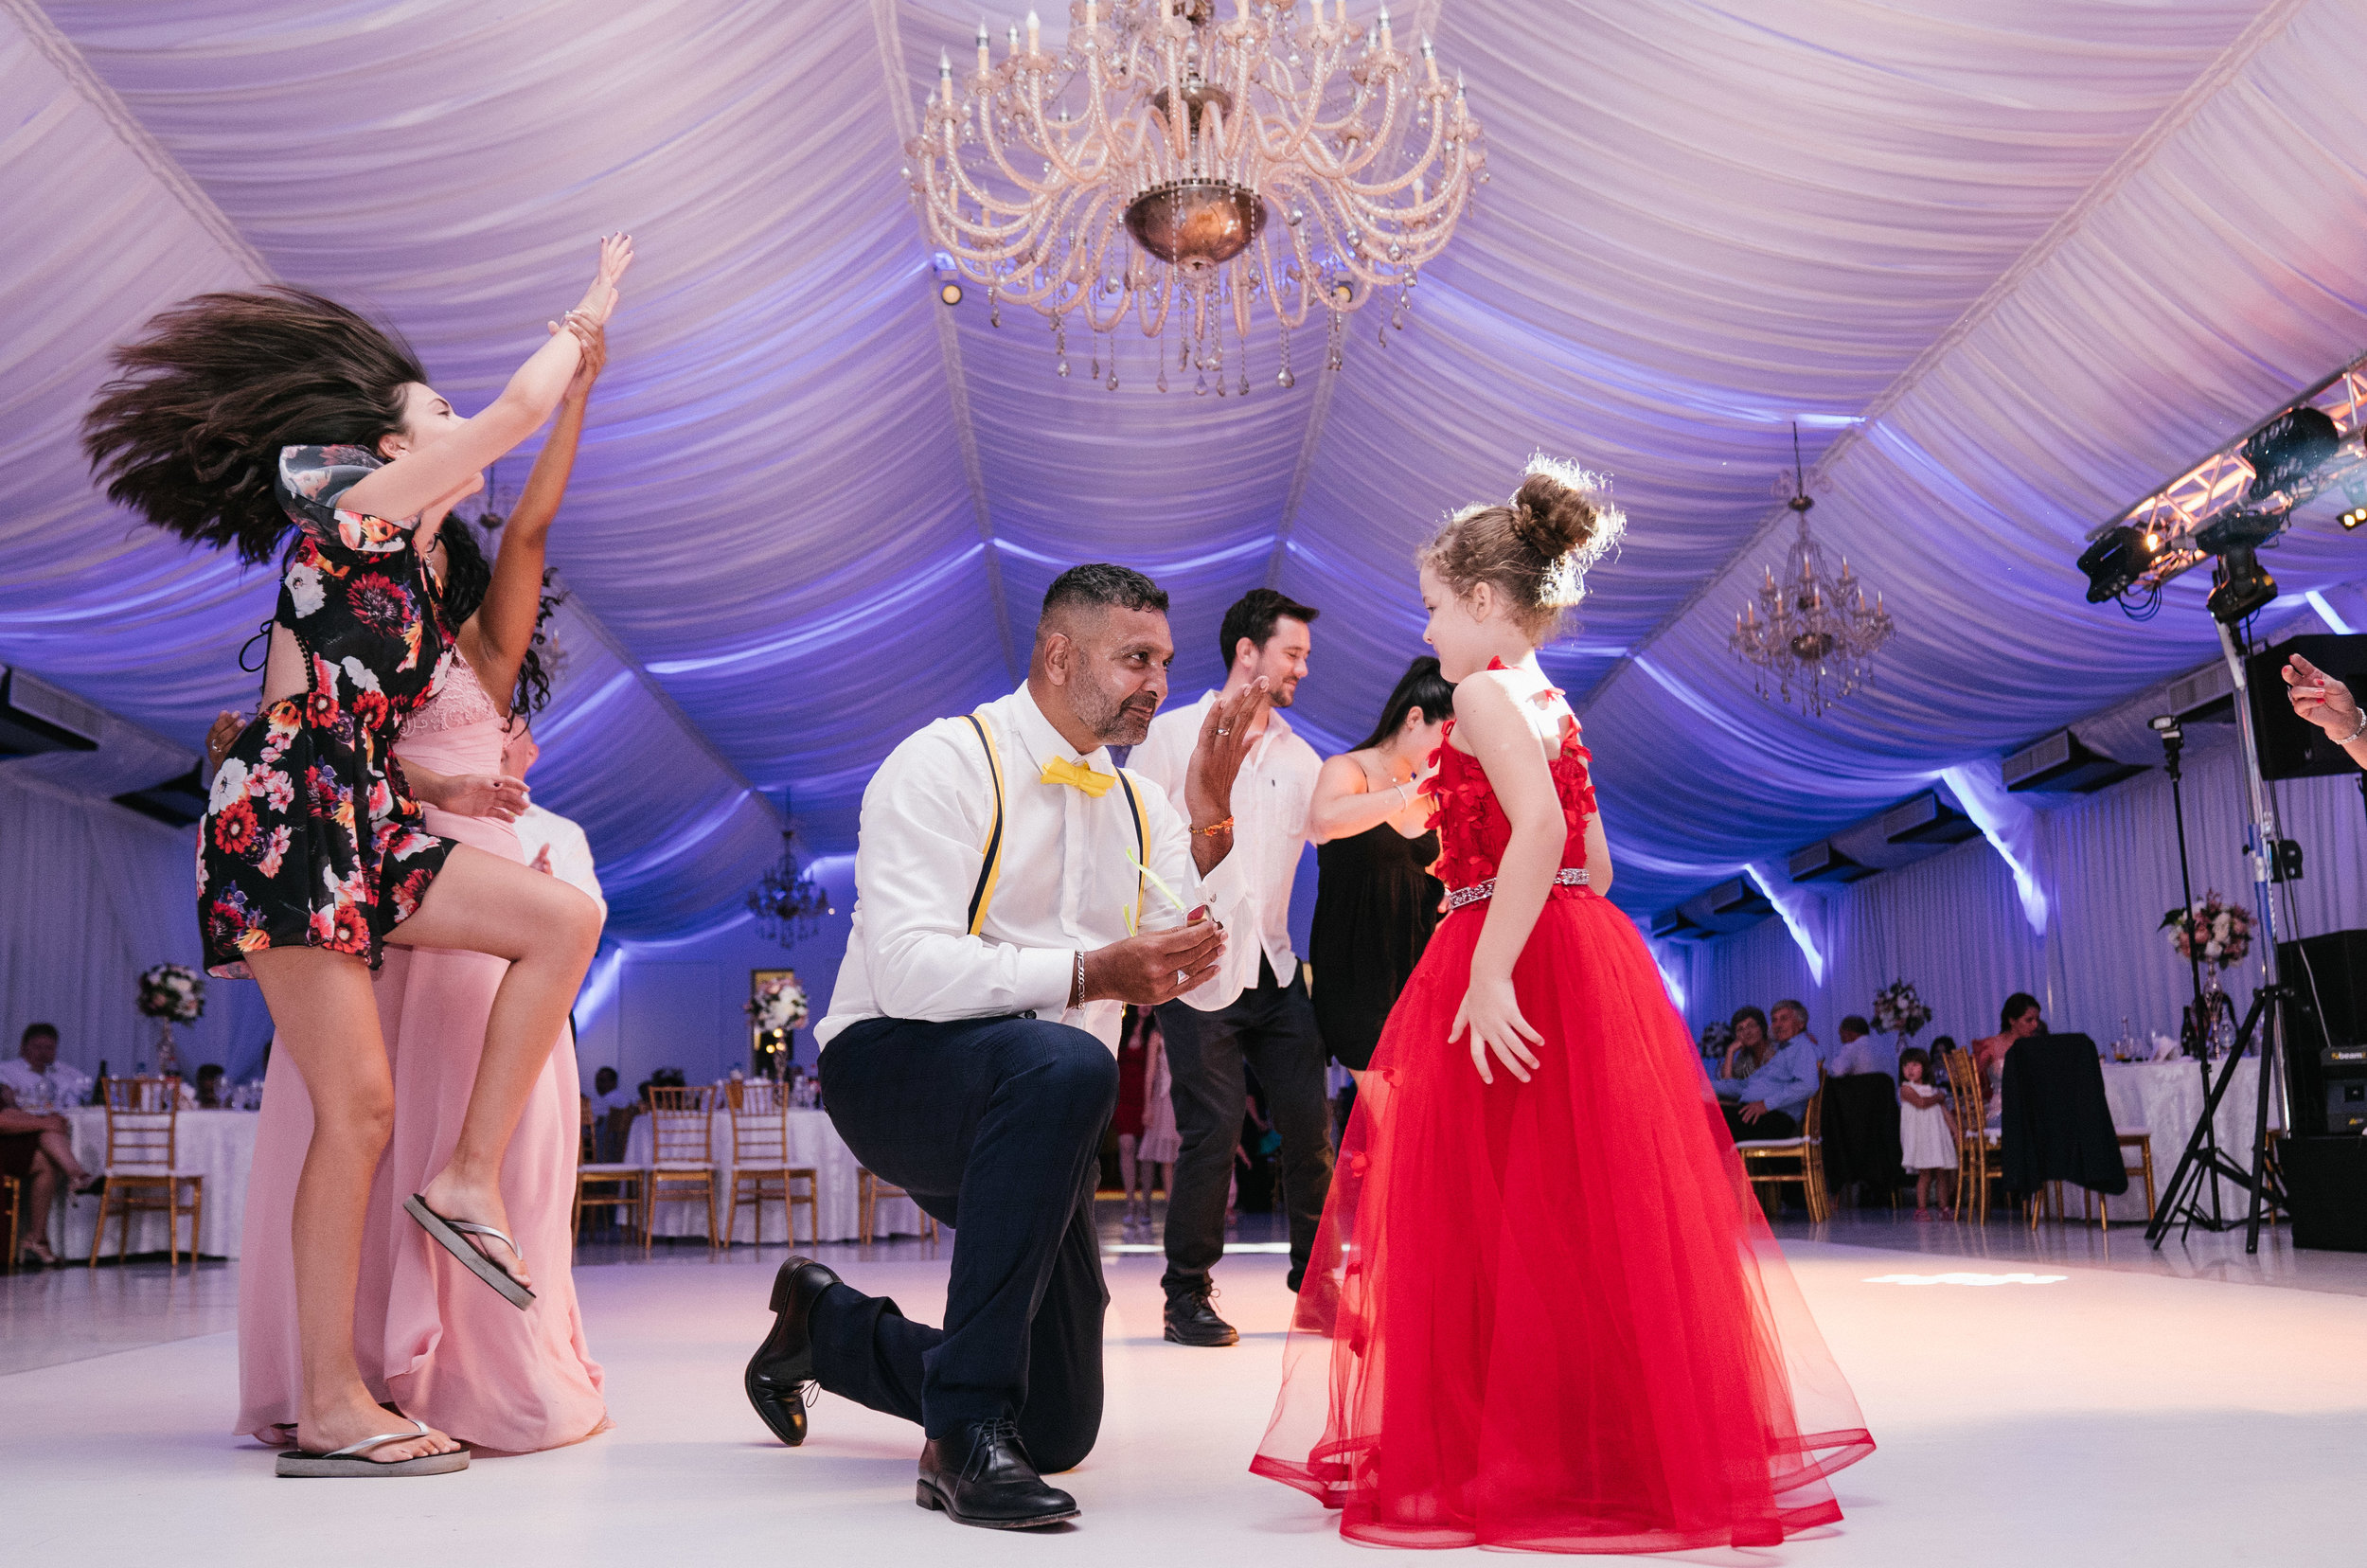 london-romania-destination-wedding-photographer-videographer-124